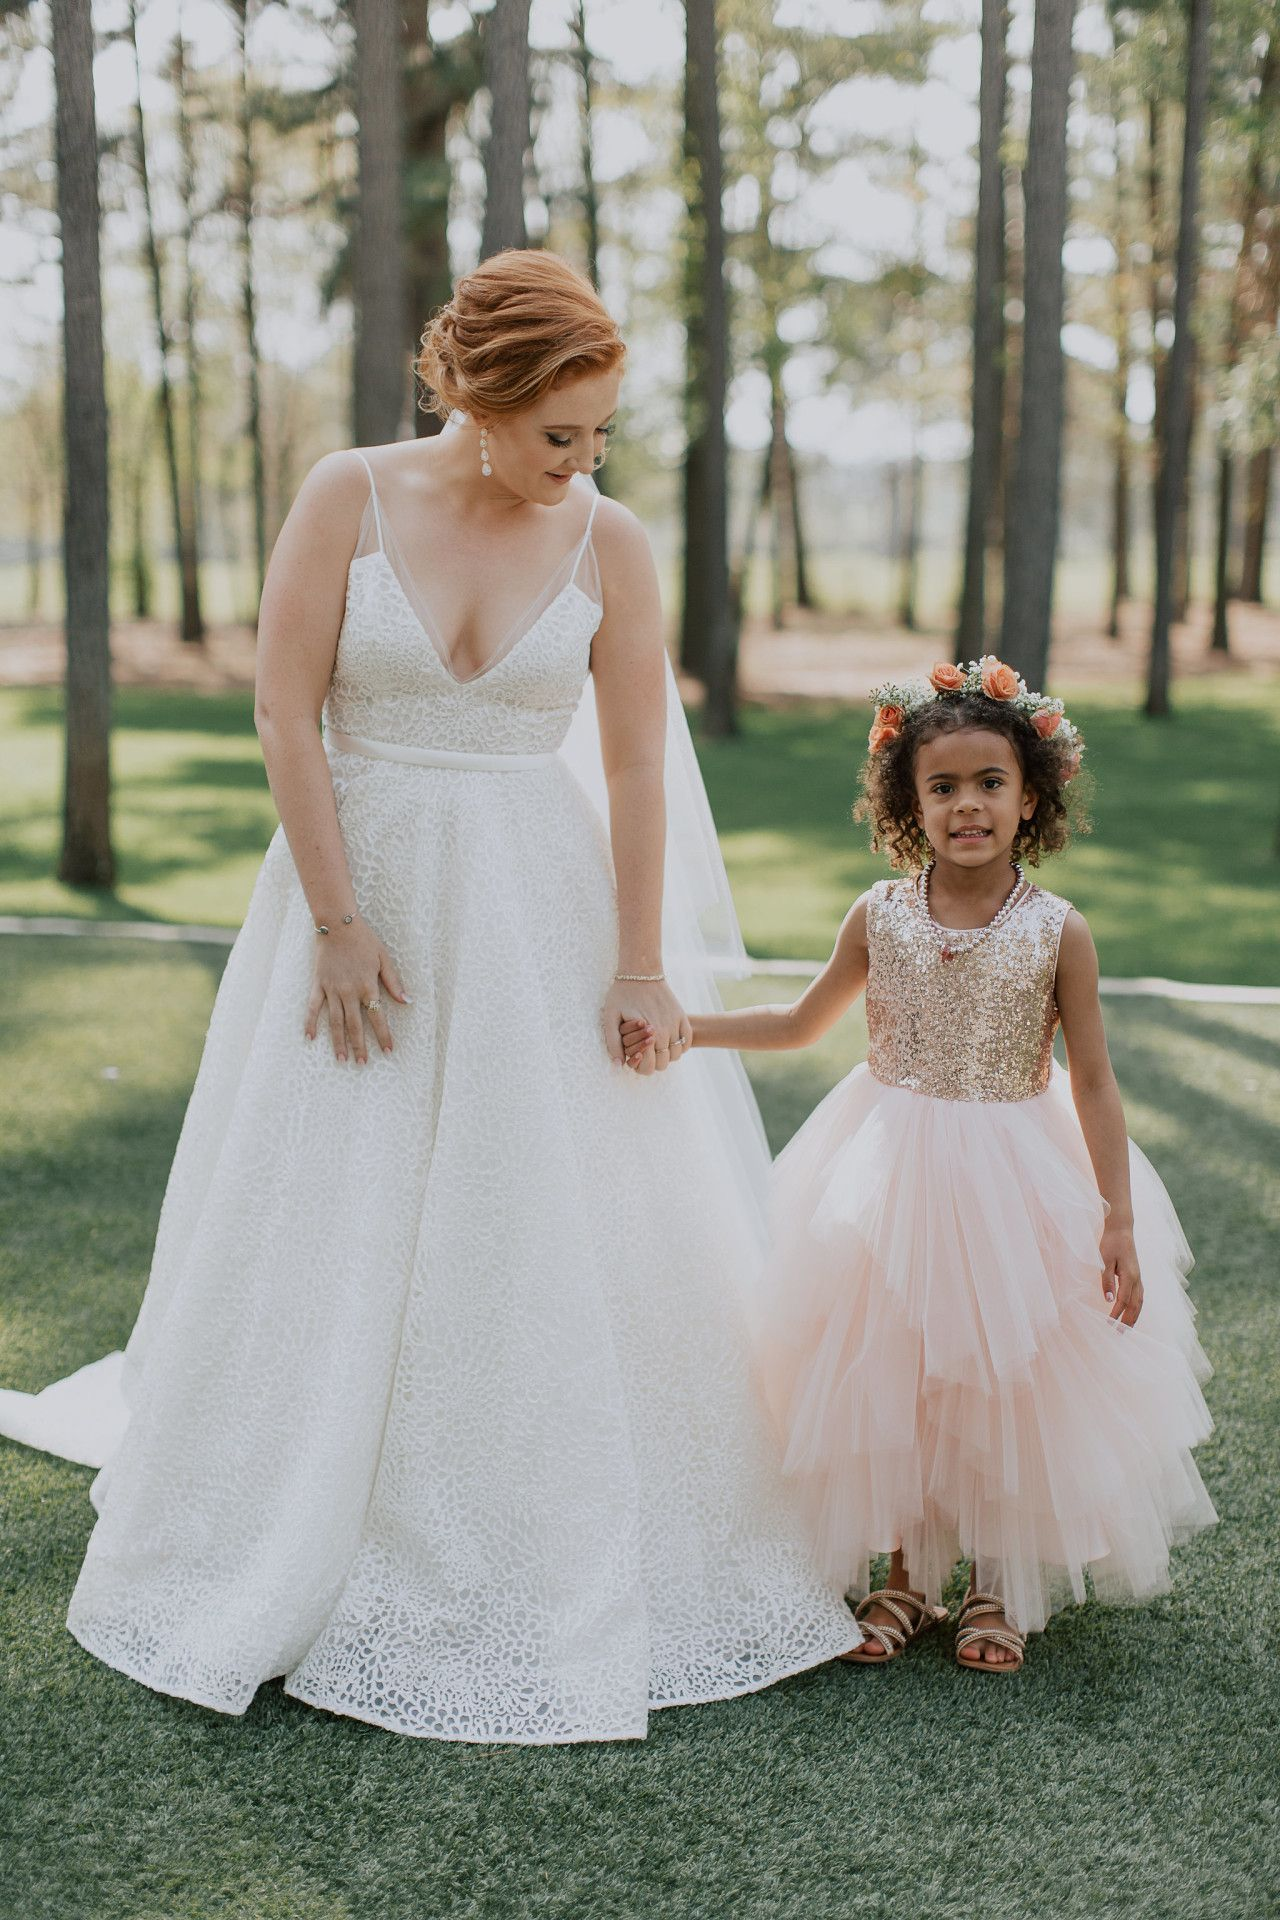 Shiny Sequin Bridesmaid Dresses /Flower Girls - Pro Wedding Invites